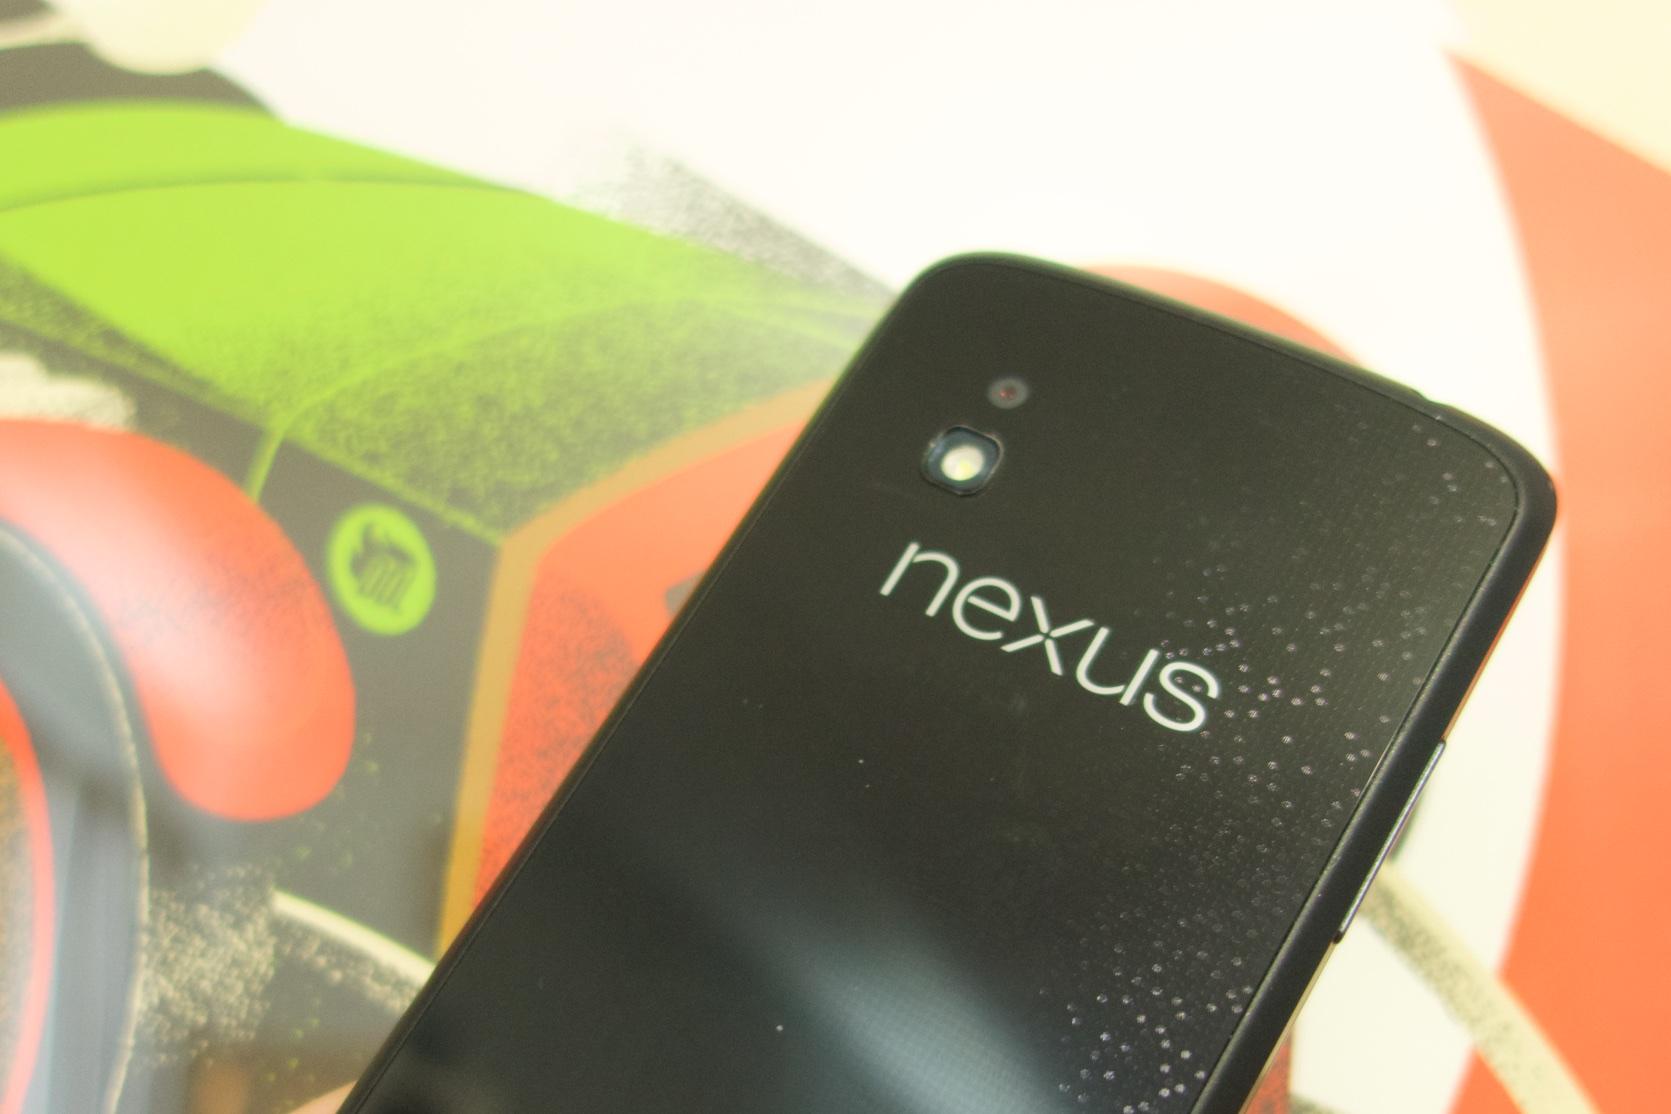 Nexus 4 Android 5.0.1 Uppdateringsrecension tidigt - 2